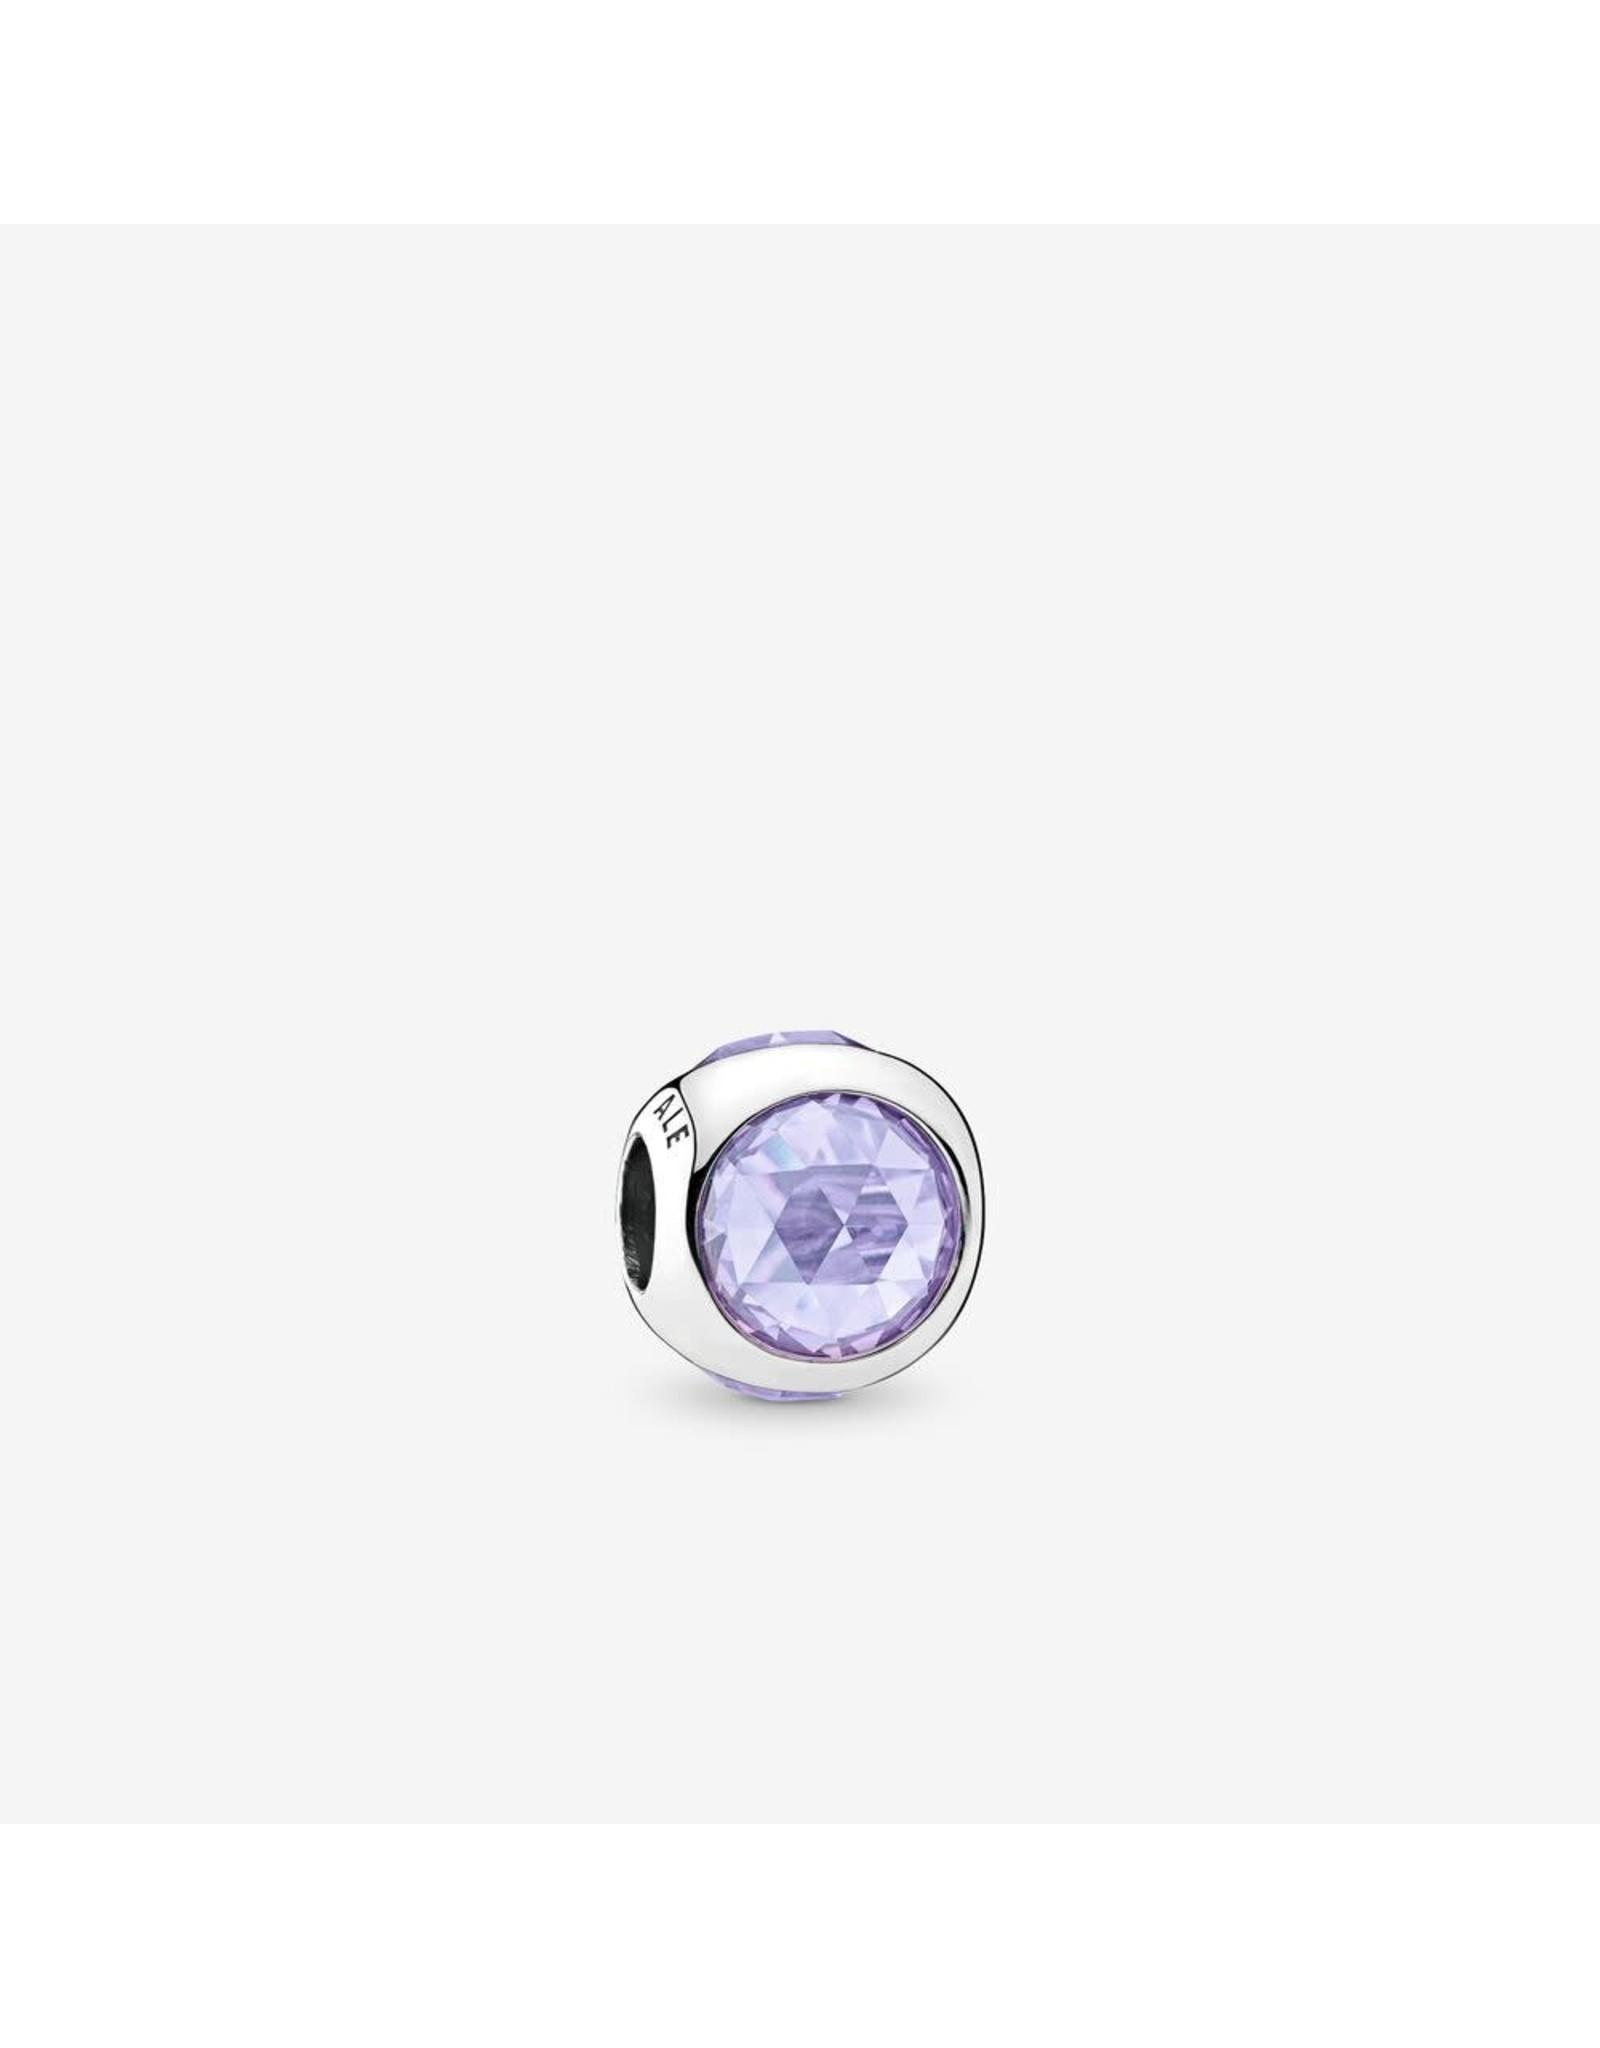 Pandora Pandora Charm, Radiant Droplet, Lavender CZ